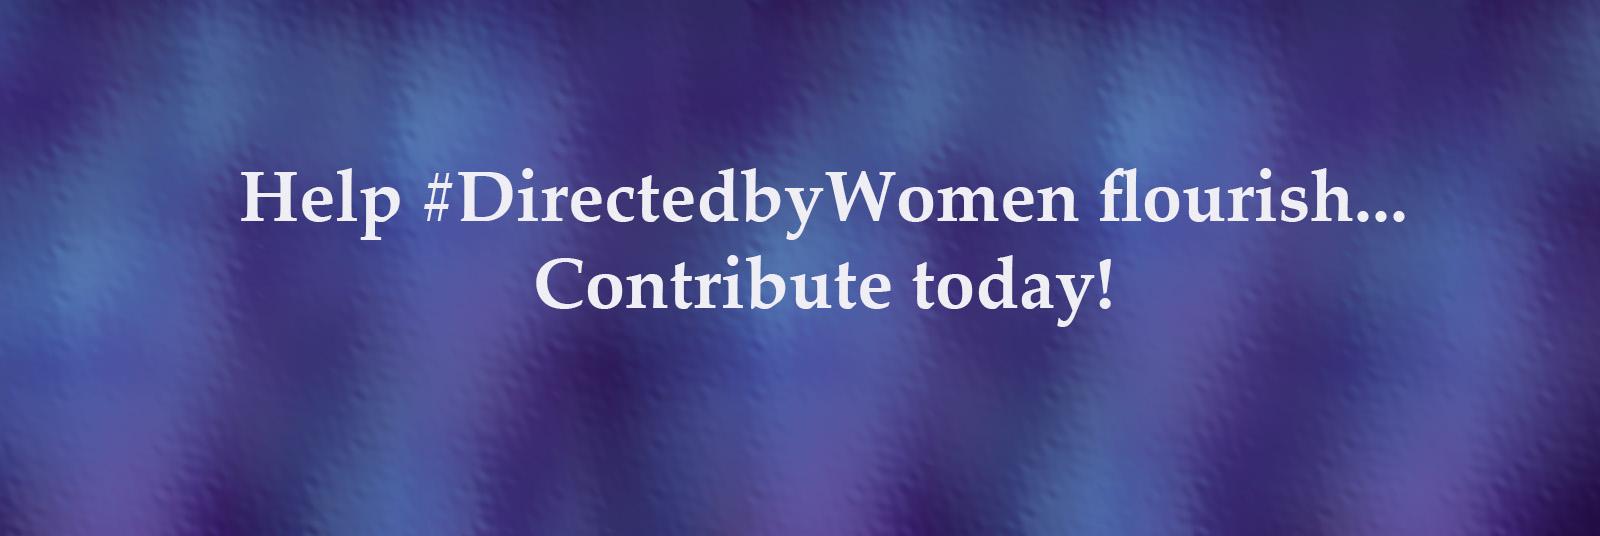 Help #DirectedbyWomen flourish... Contribute today!